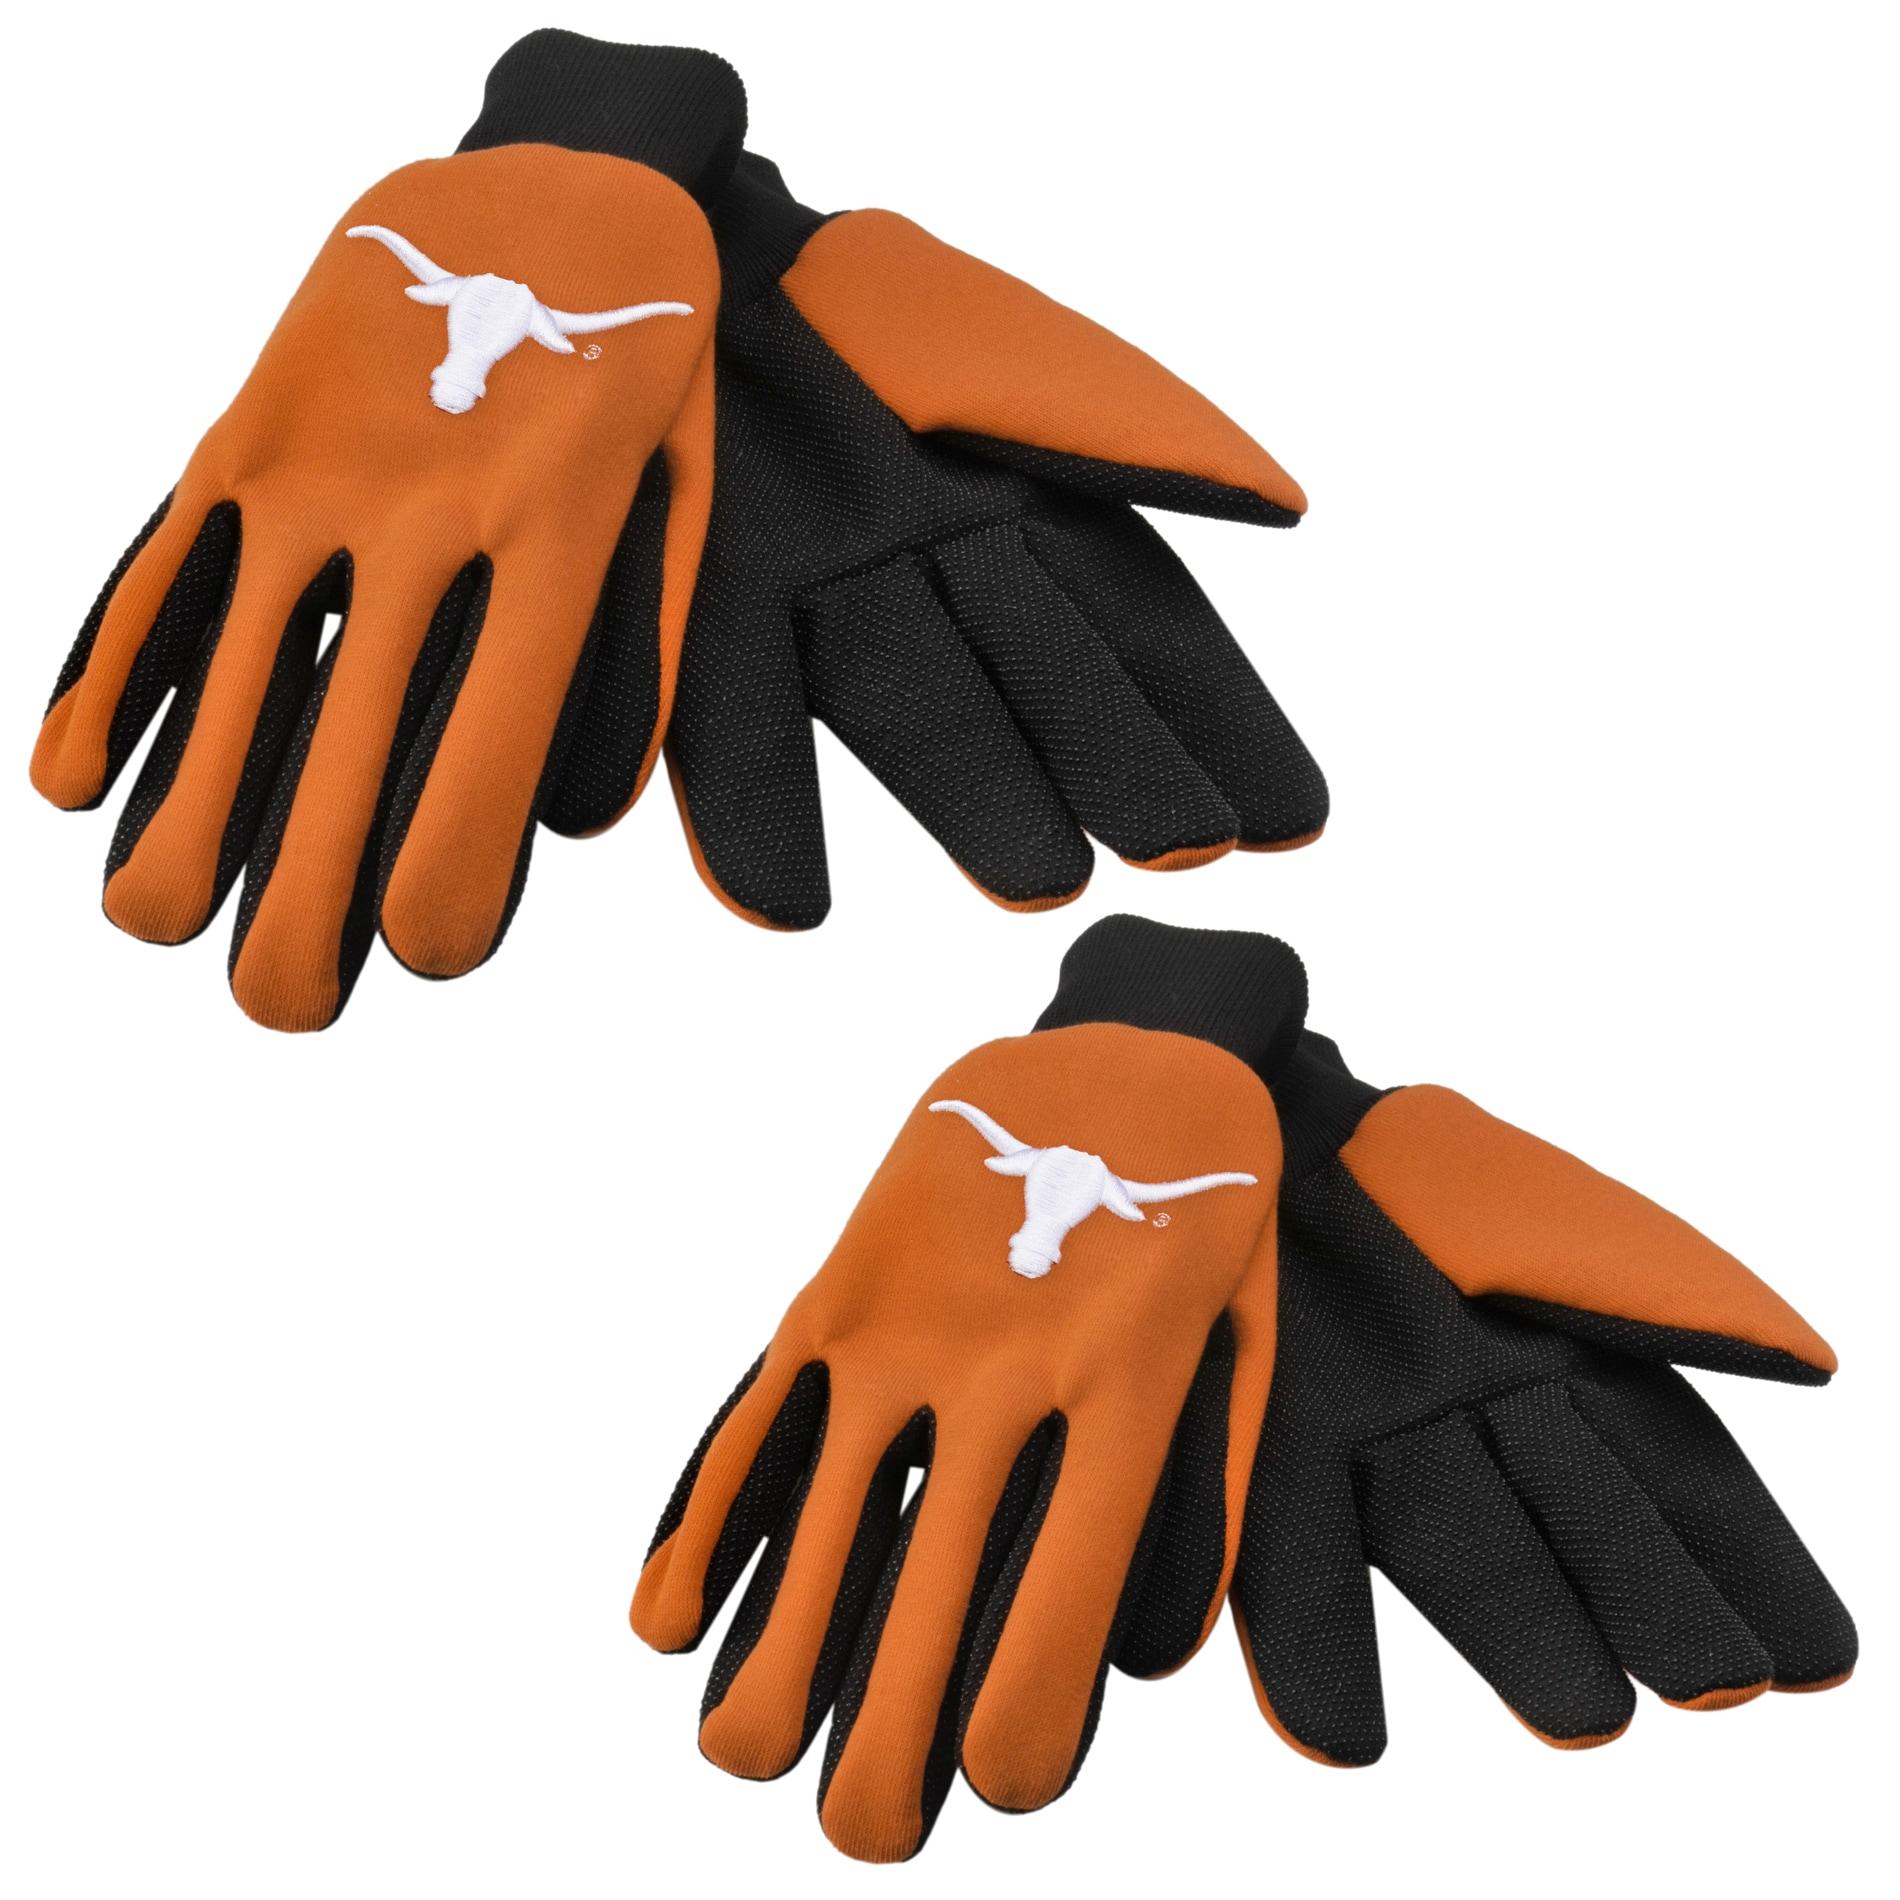 Texas Longhorns Two-tone Work Gloves (Set of 2 Pair)